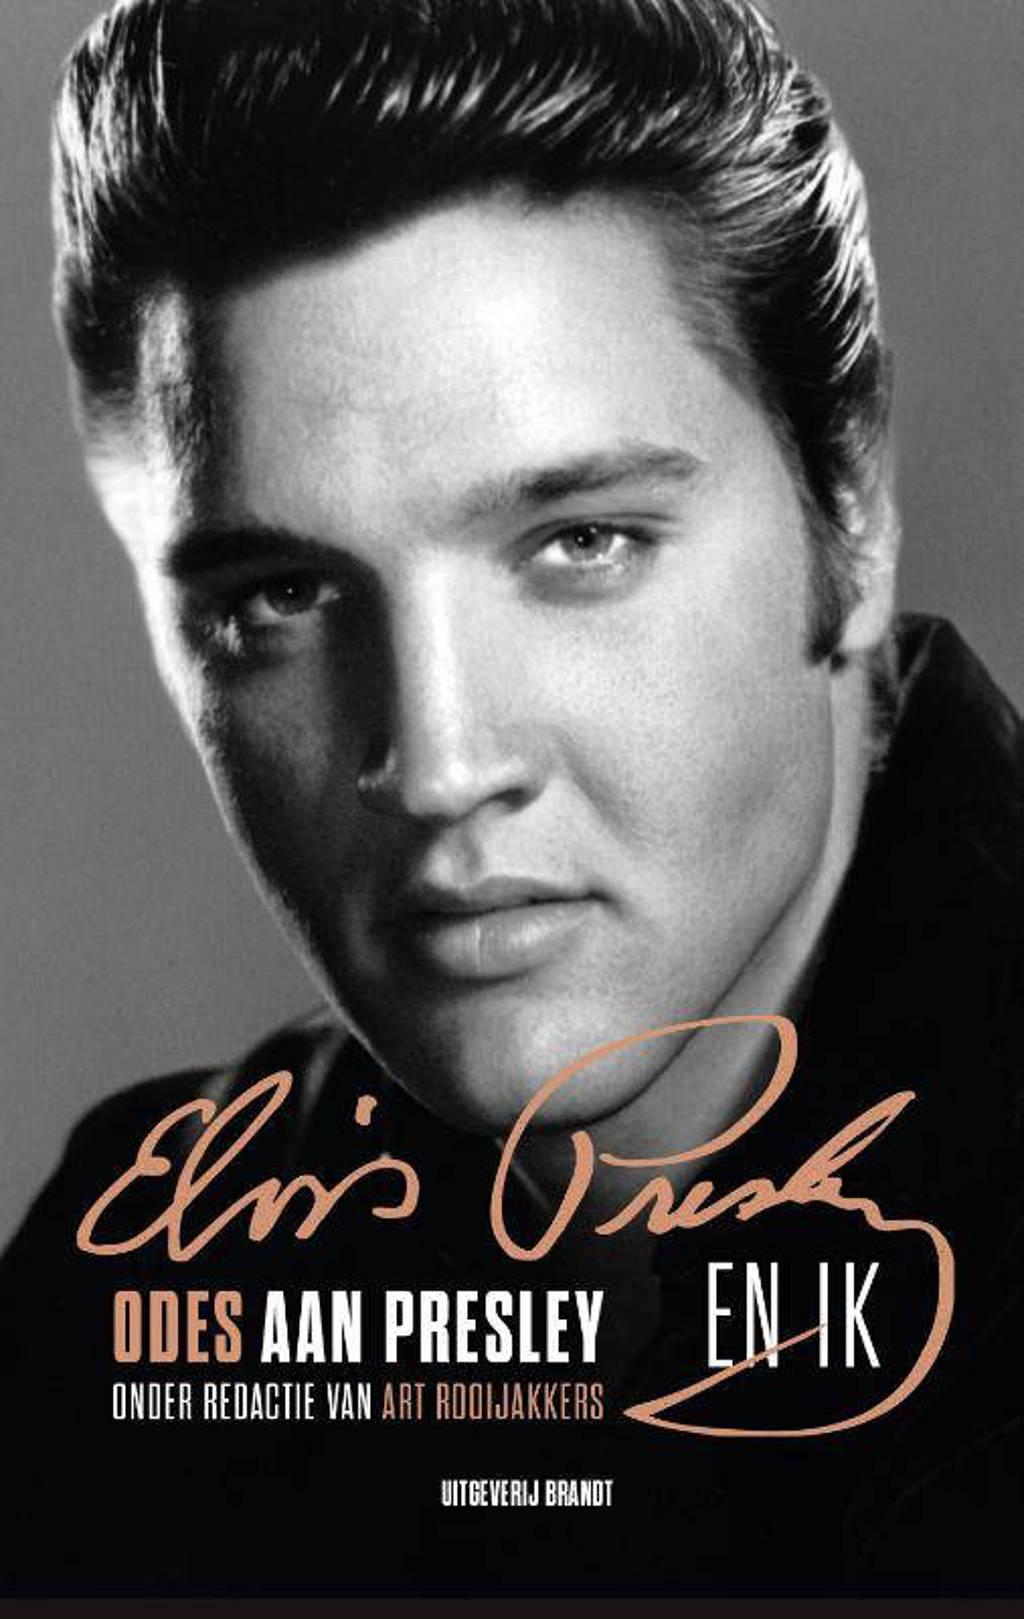 Elvis en ik